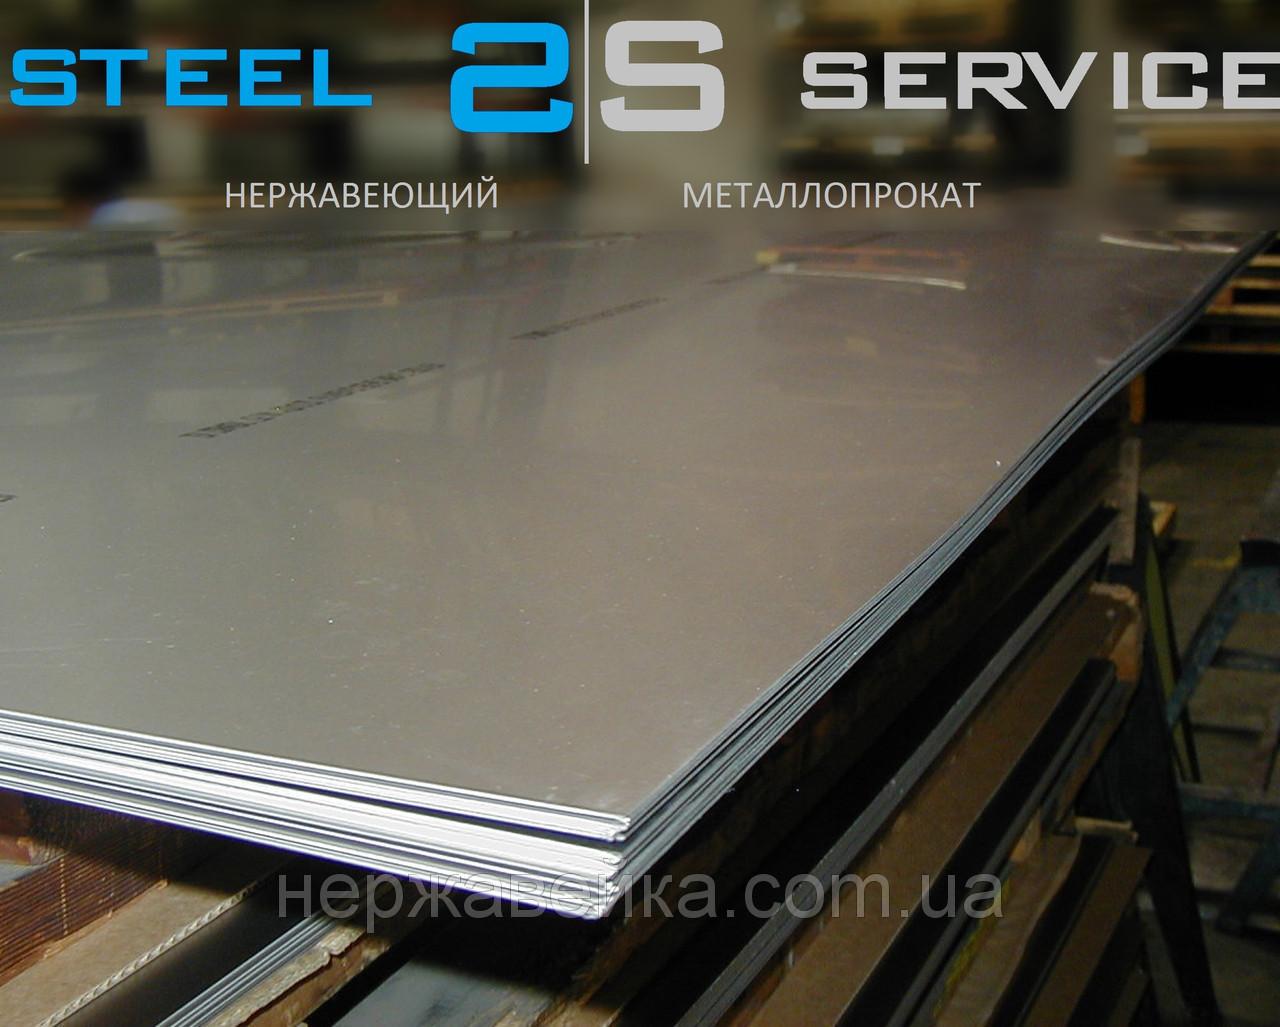 Листовая нержавейка 12х1500х6000мм  AISI 316Ti(10Х17Н13М2Т) F1 - горячекатанный,  кислотостойкий